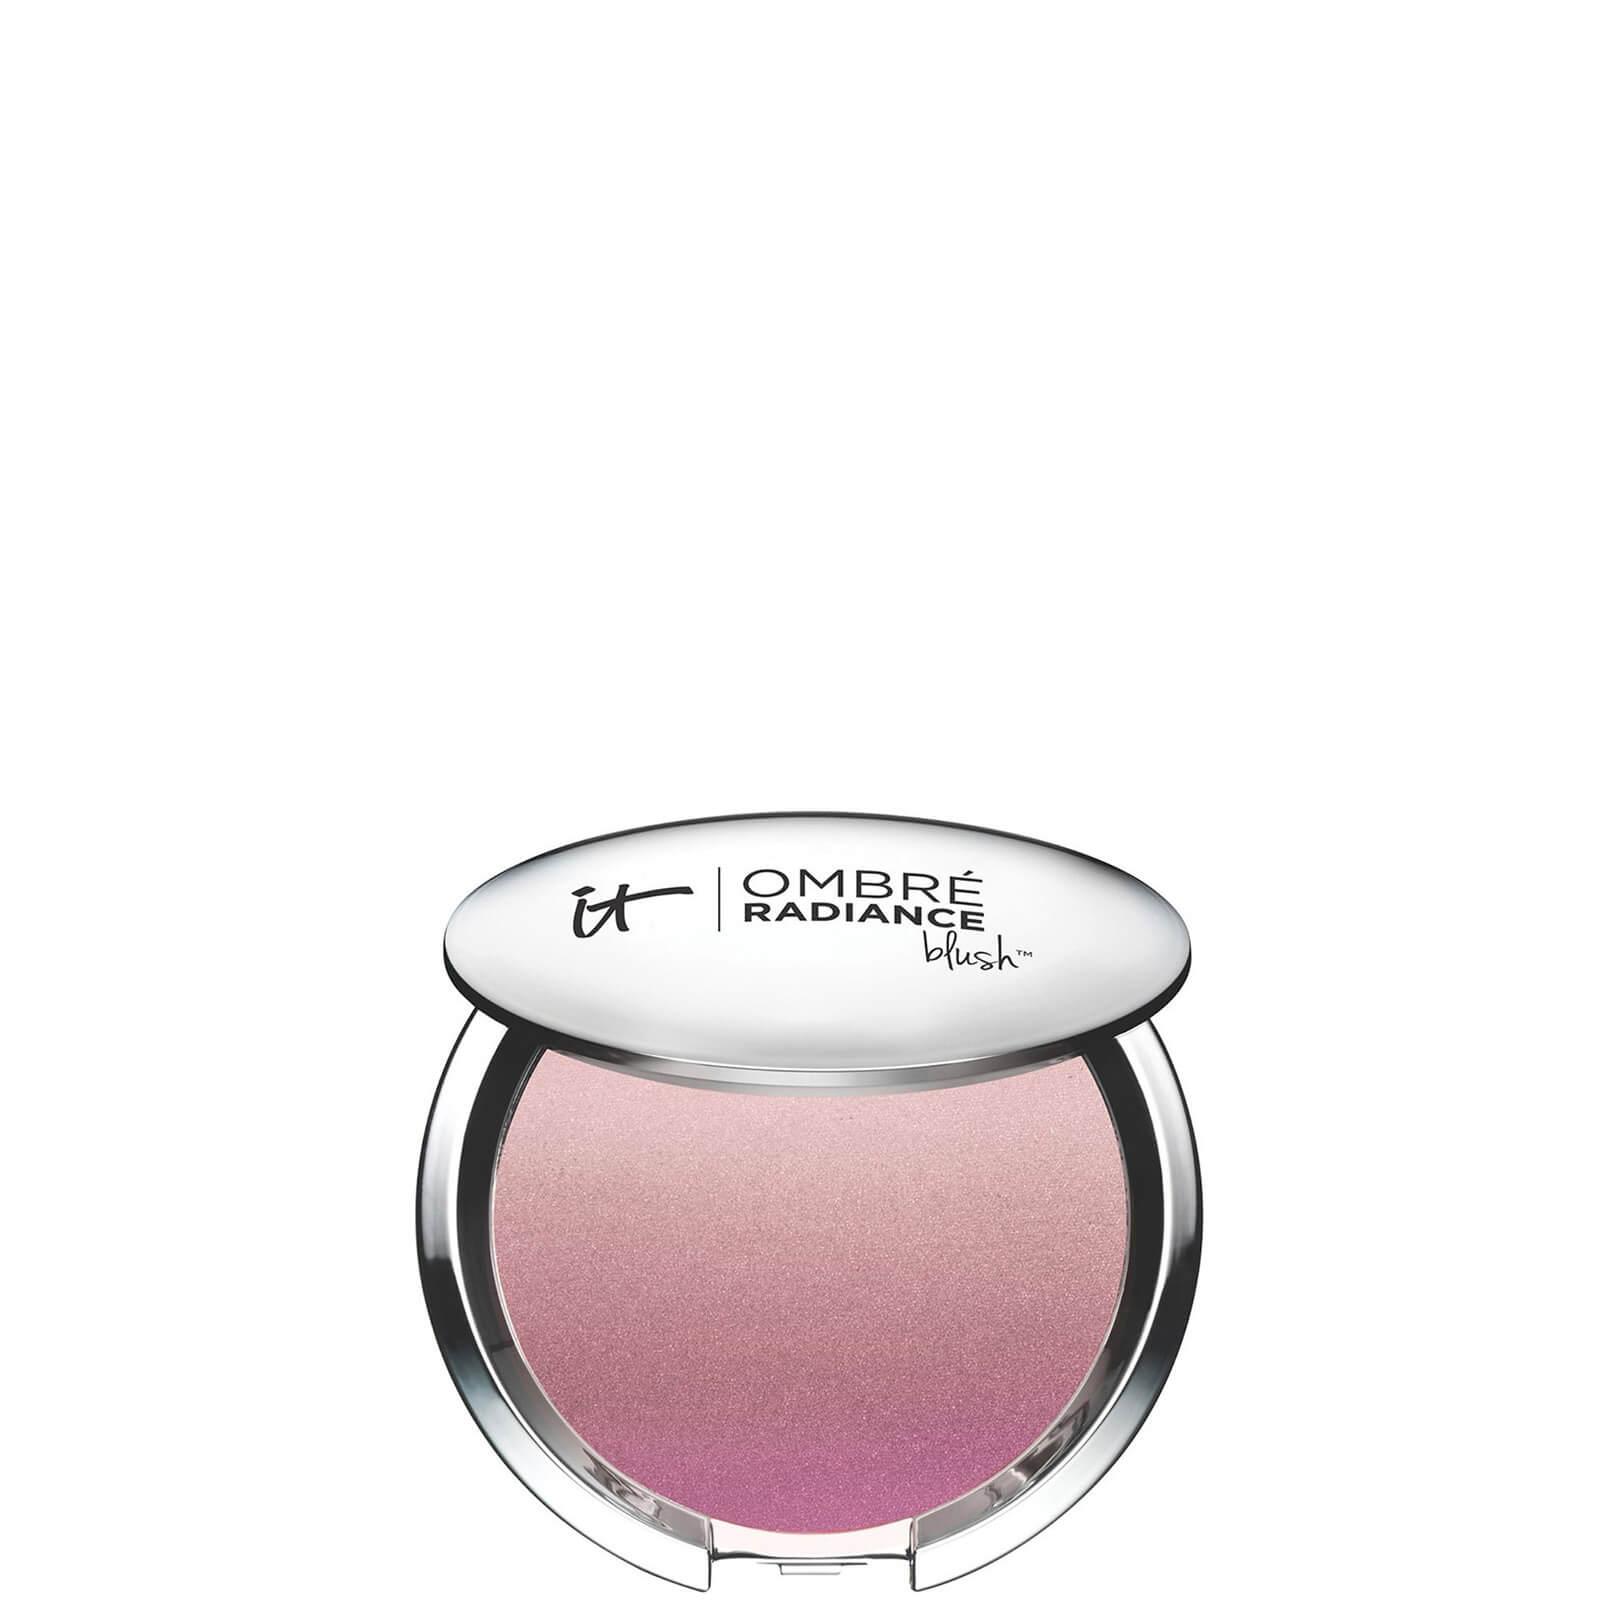 Купить IT Cosmetics Ombré Radiance Blush 10.8g (Various Shades) - Sugar Plum